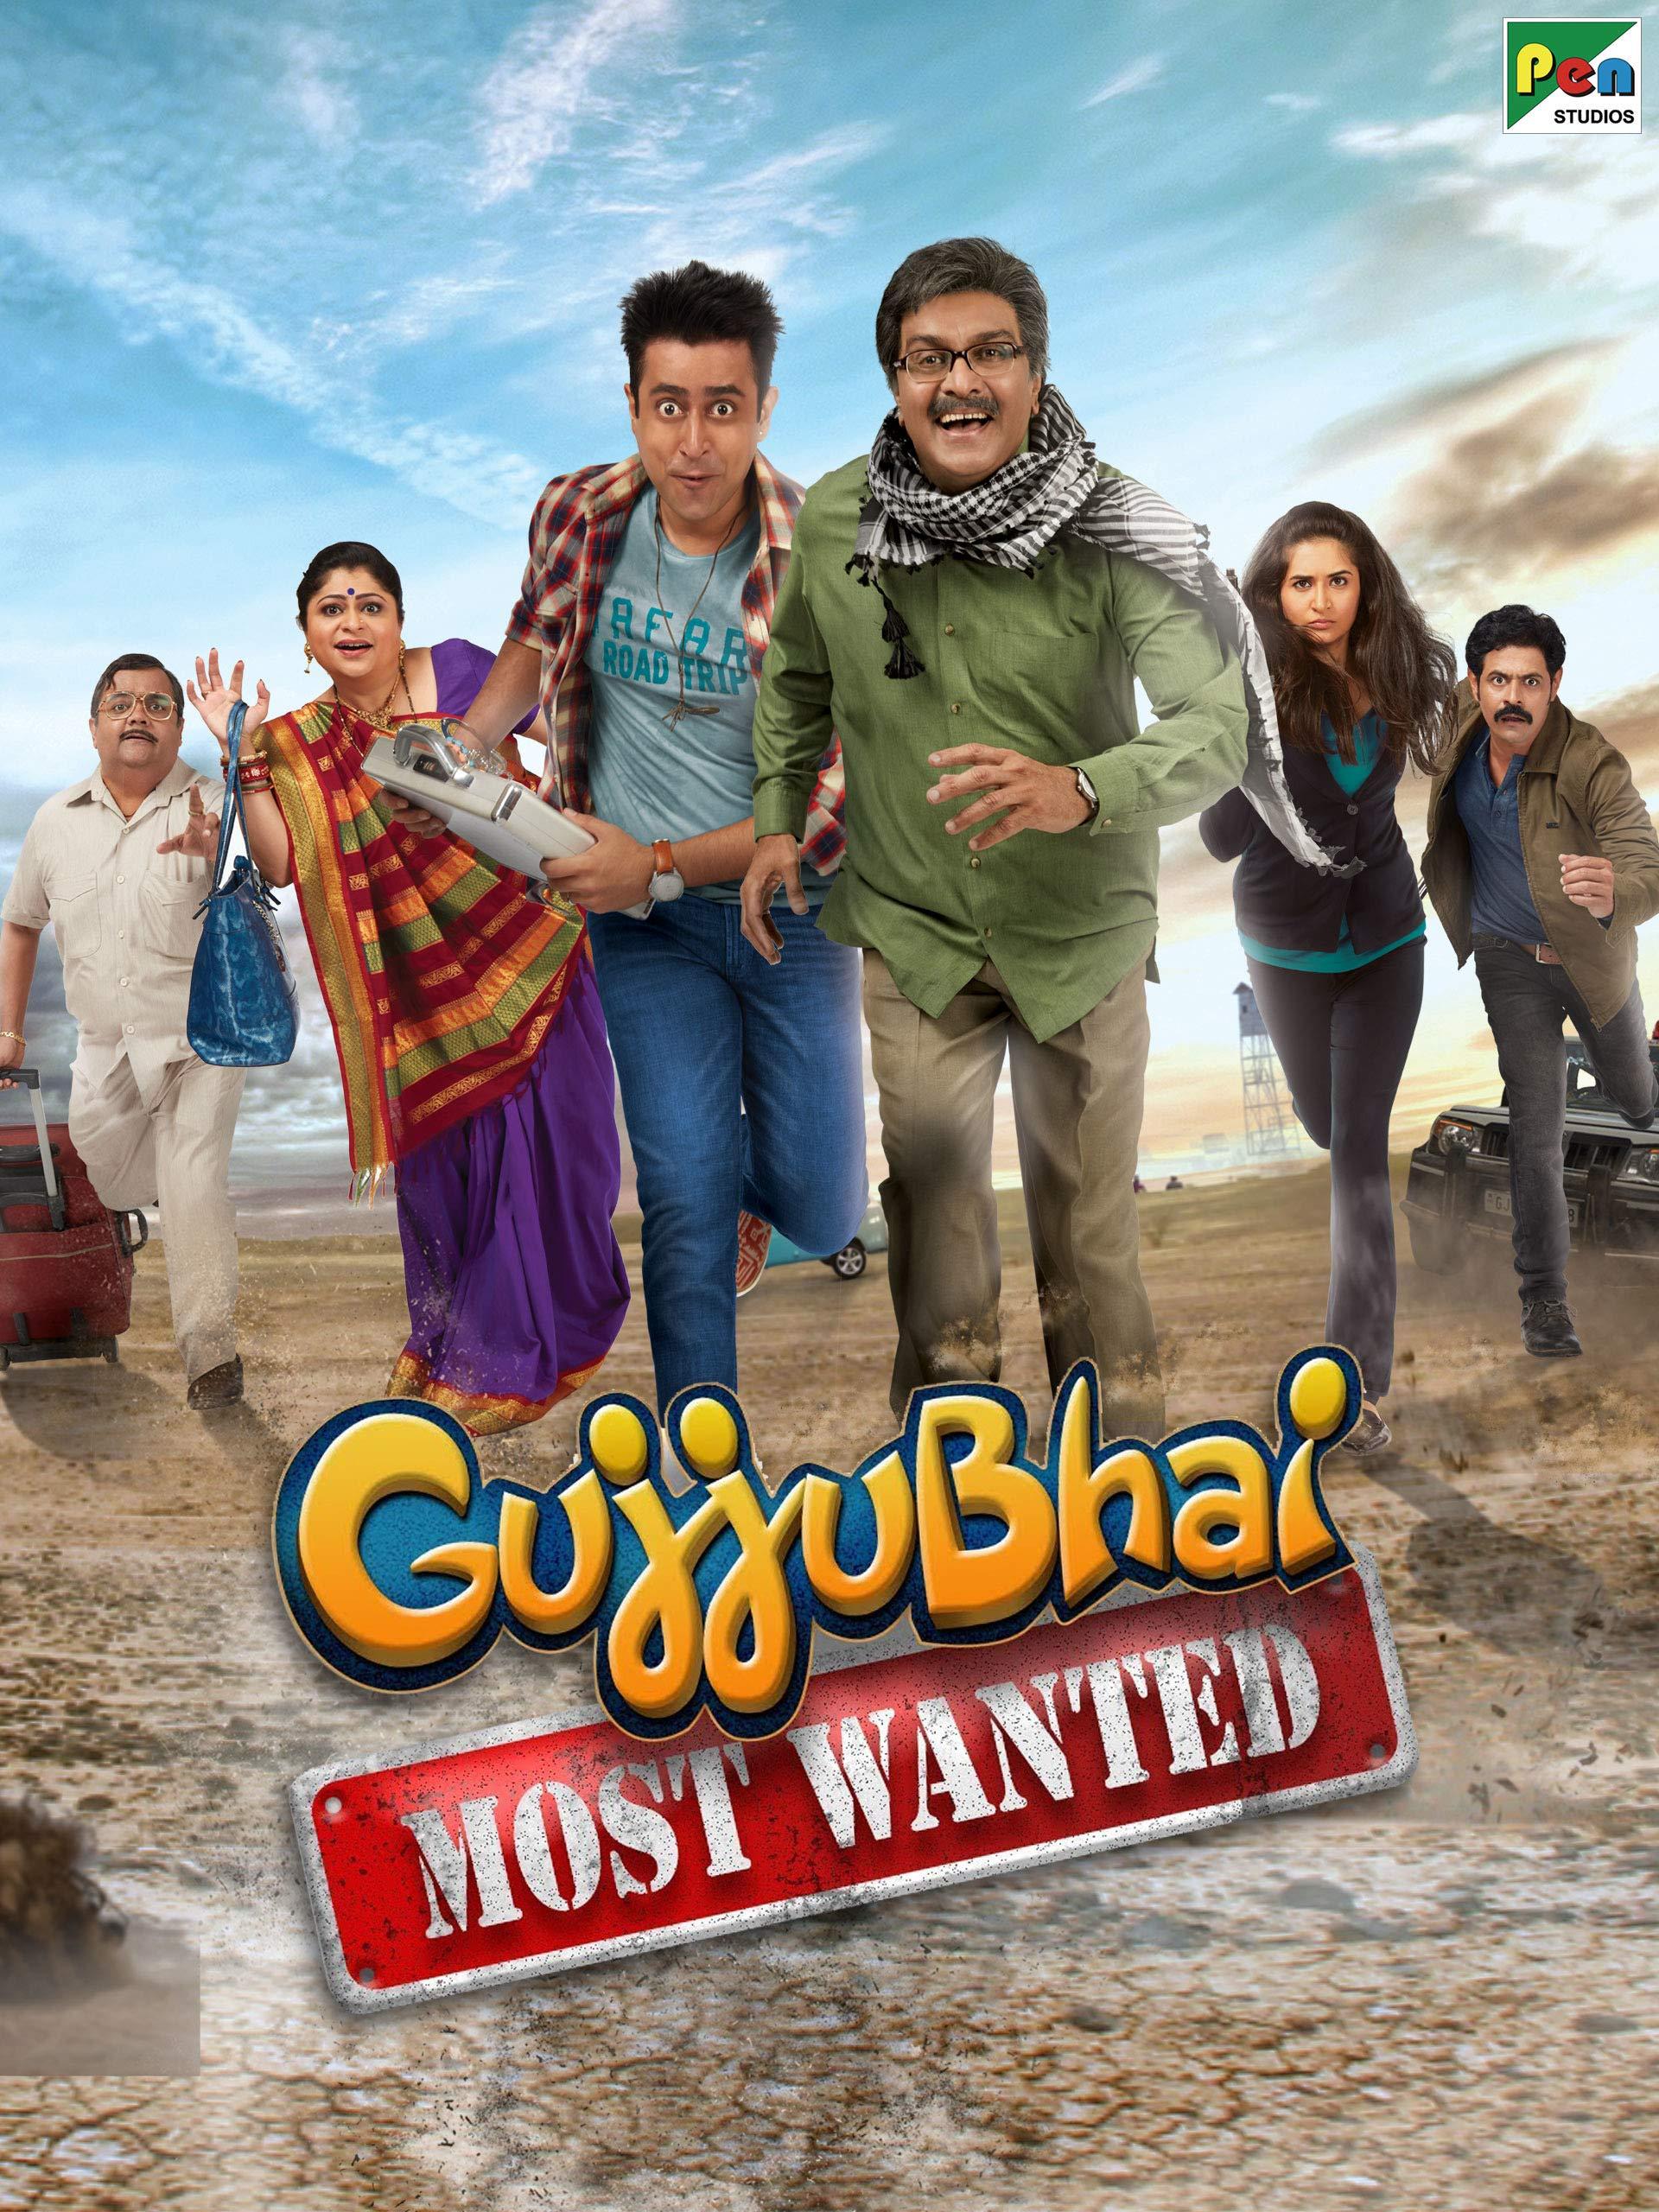 Gujjubhai Most Wanted on Amazon Prime Video UK